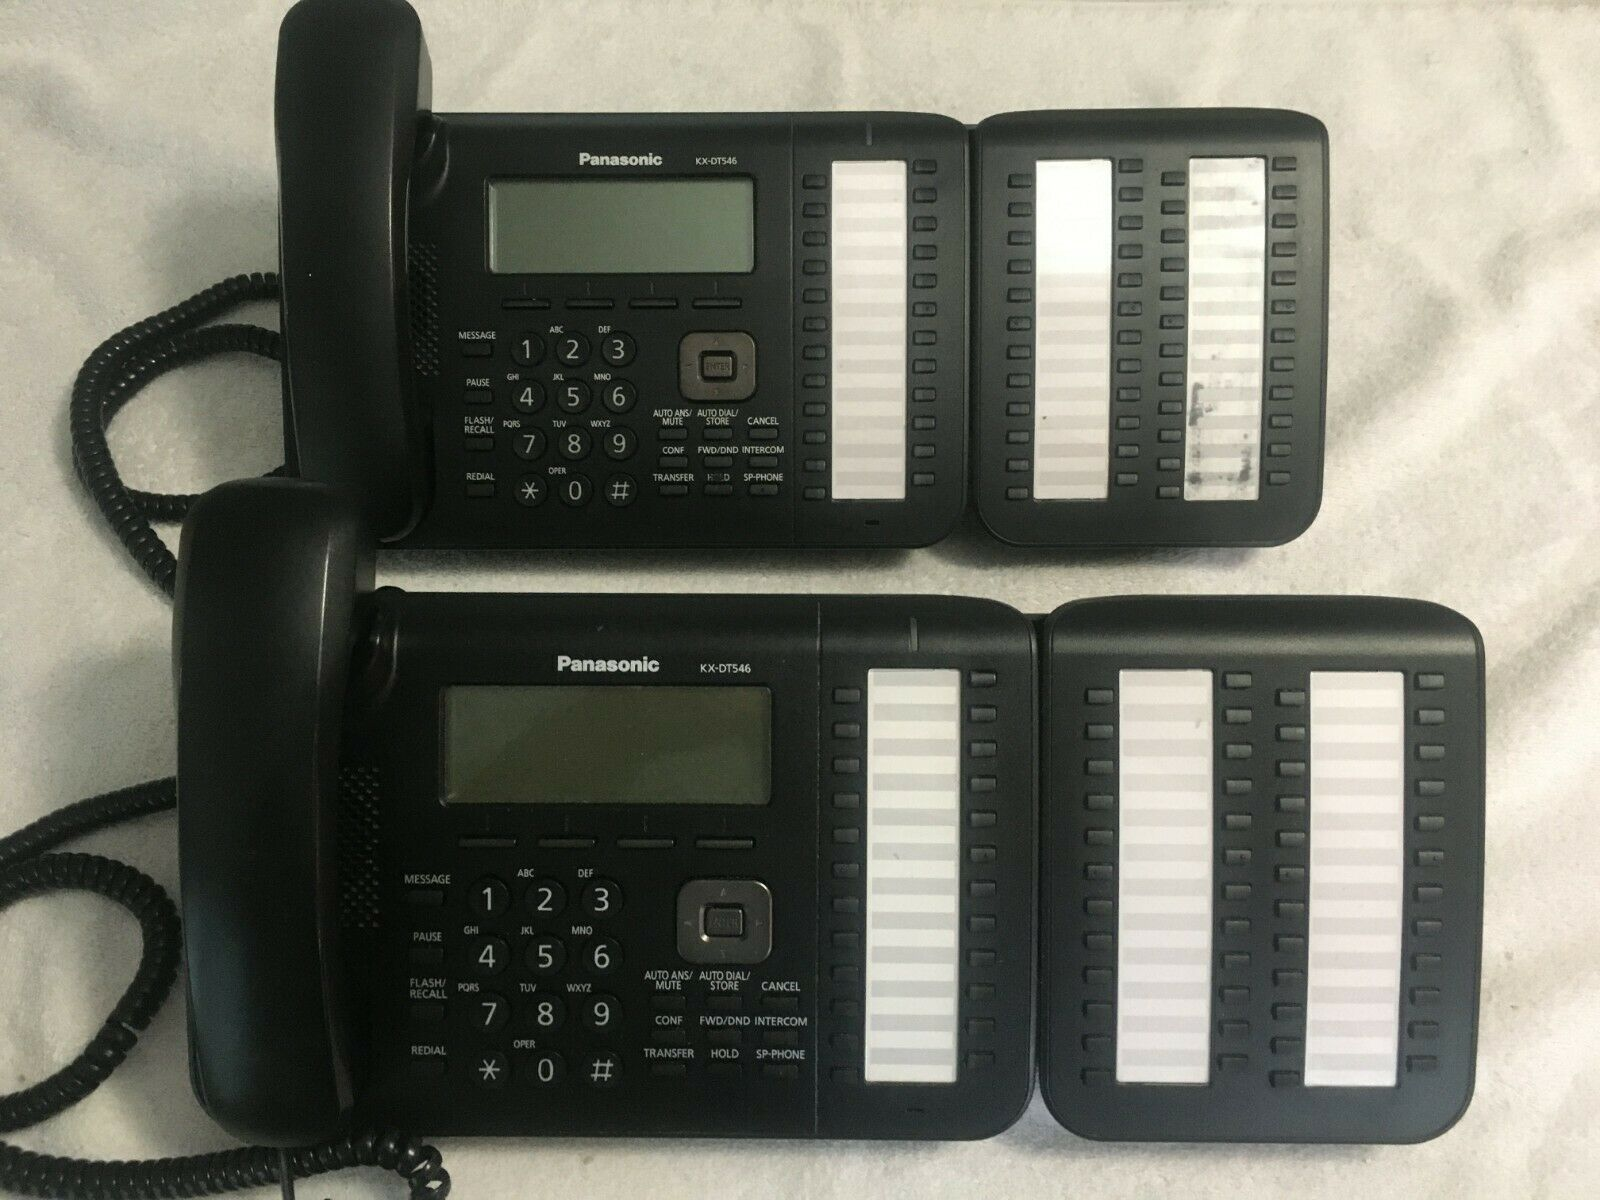 Brand New Panasonic KX-T7601-B Black USB Module for Desktop Phone KX-T7601X-B